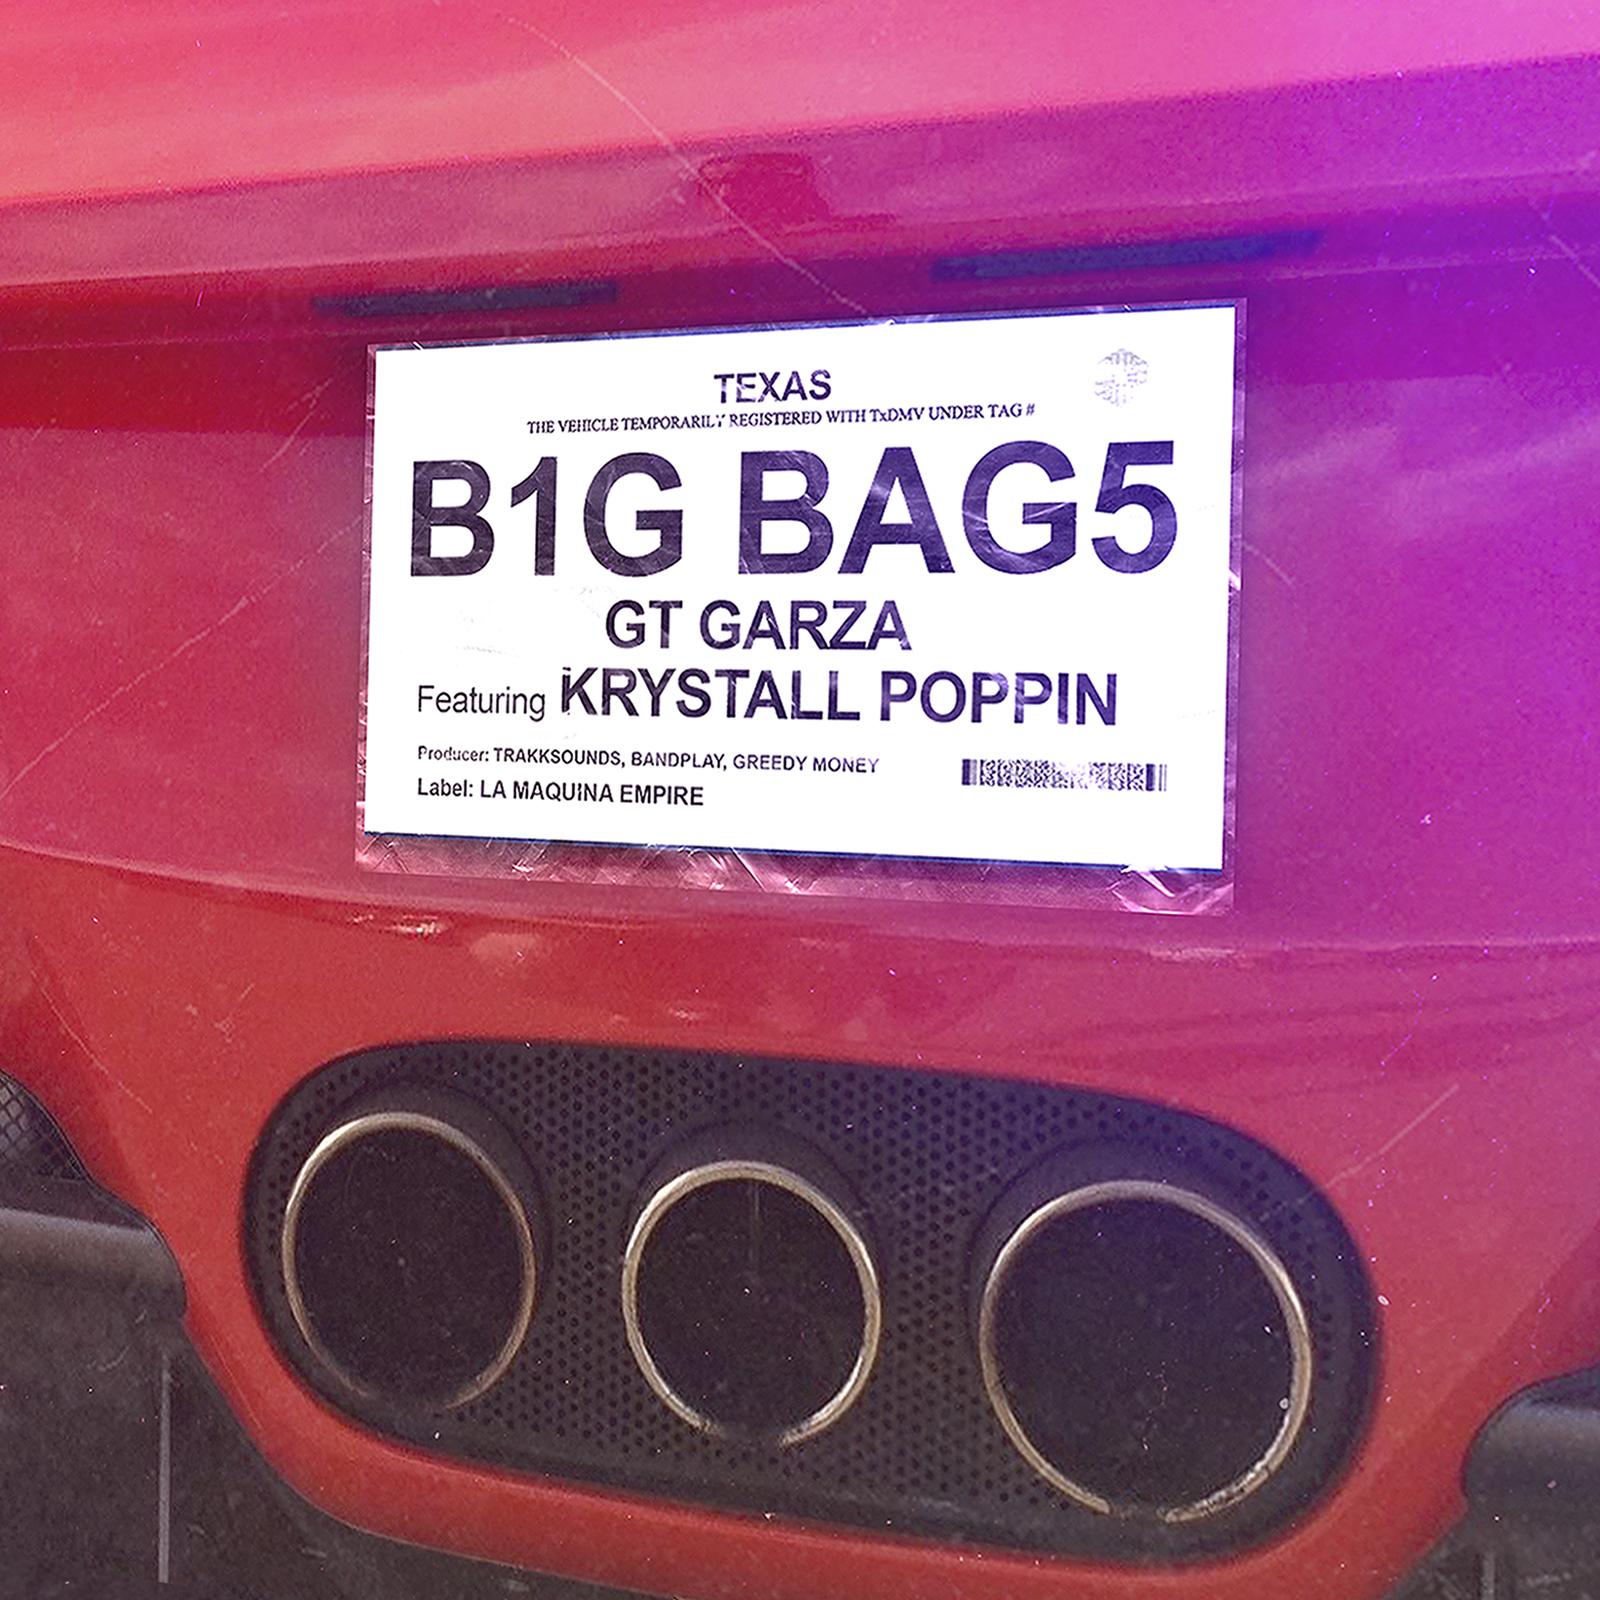 Big Bags - GT GARZA FEAT. KRYSTALL P